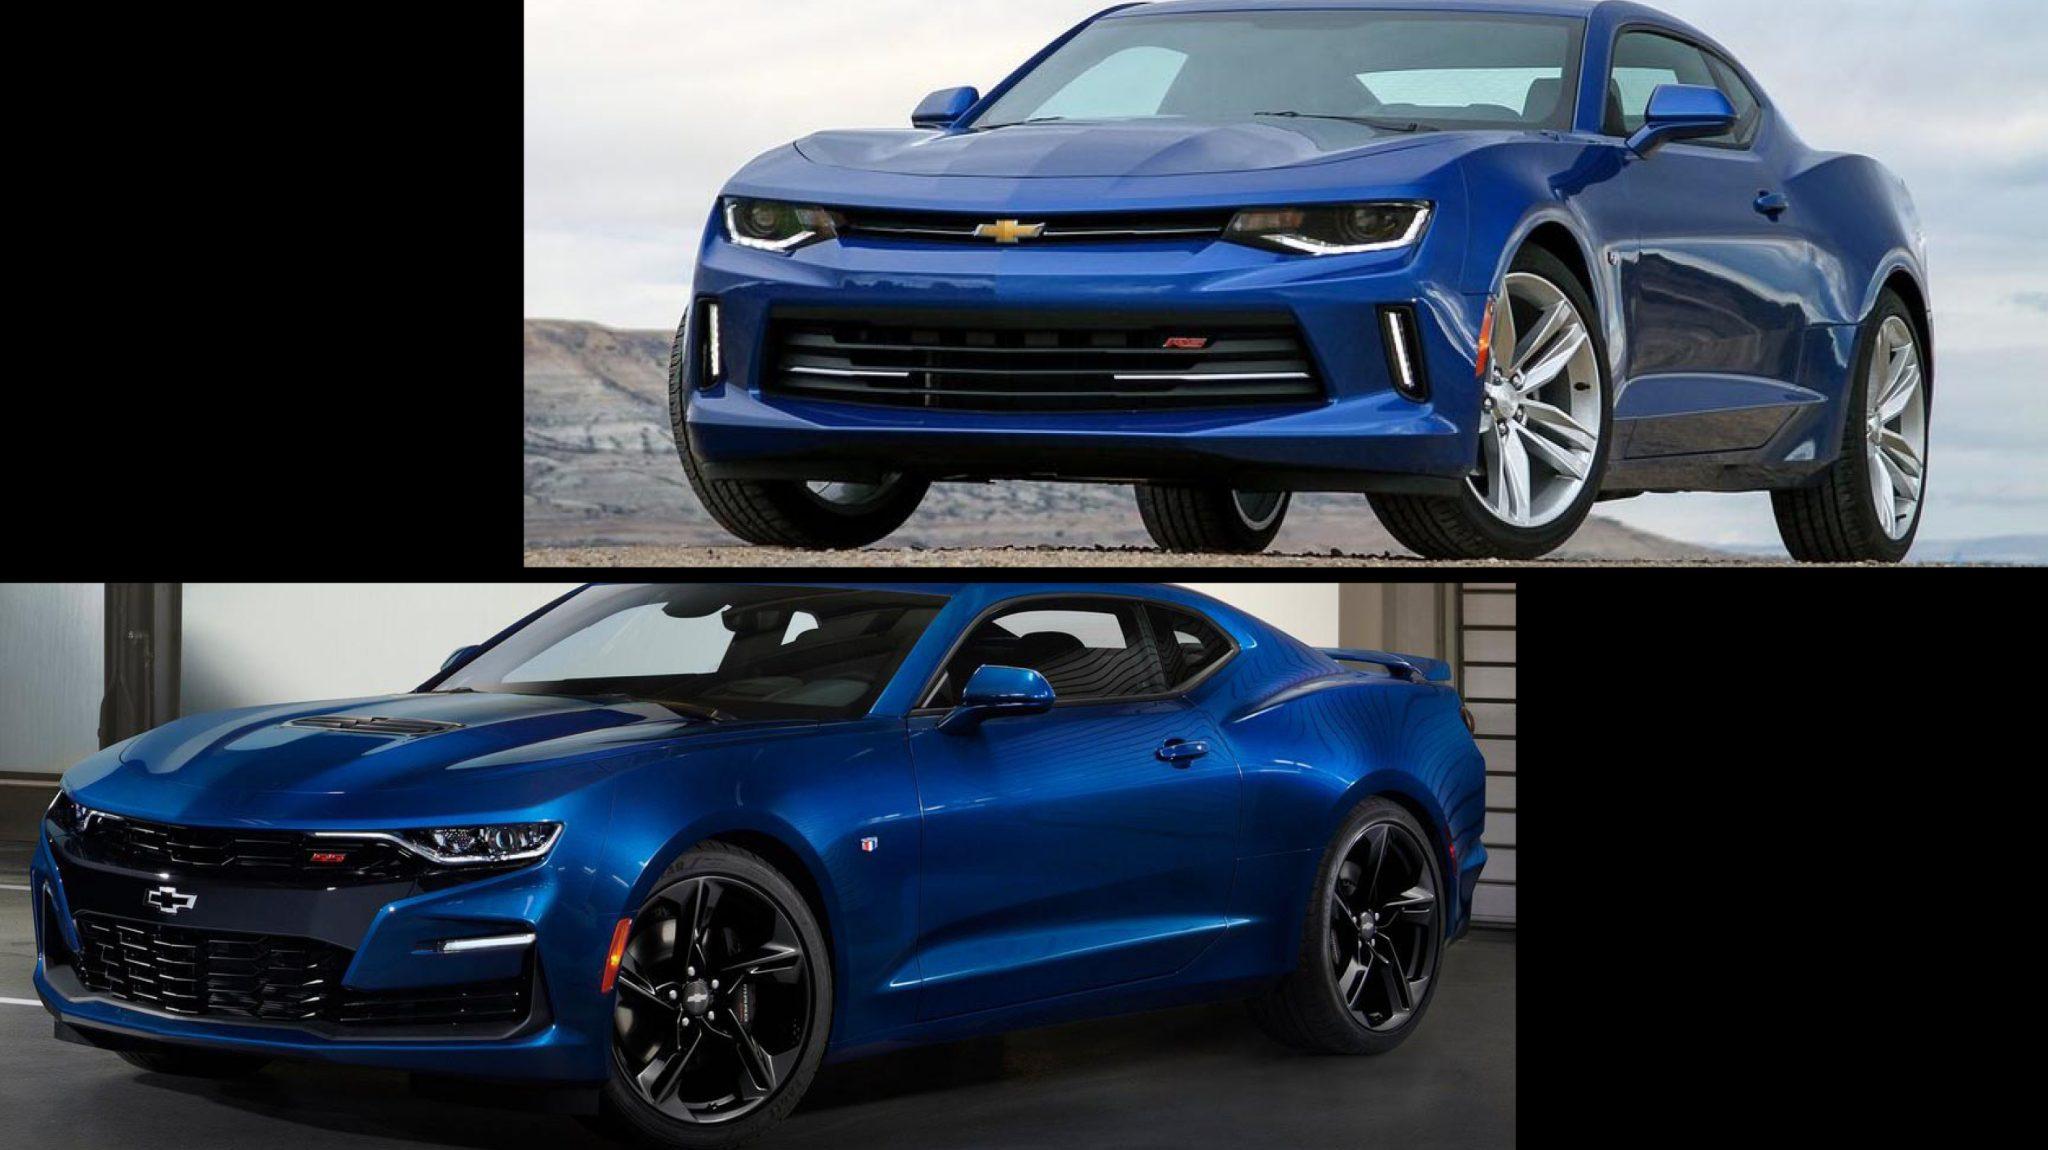 Chevrolet Camaro SS Facelift vs Pre-facelift